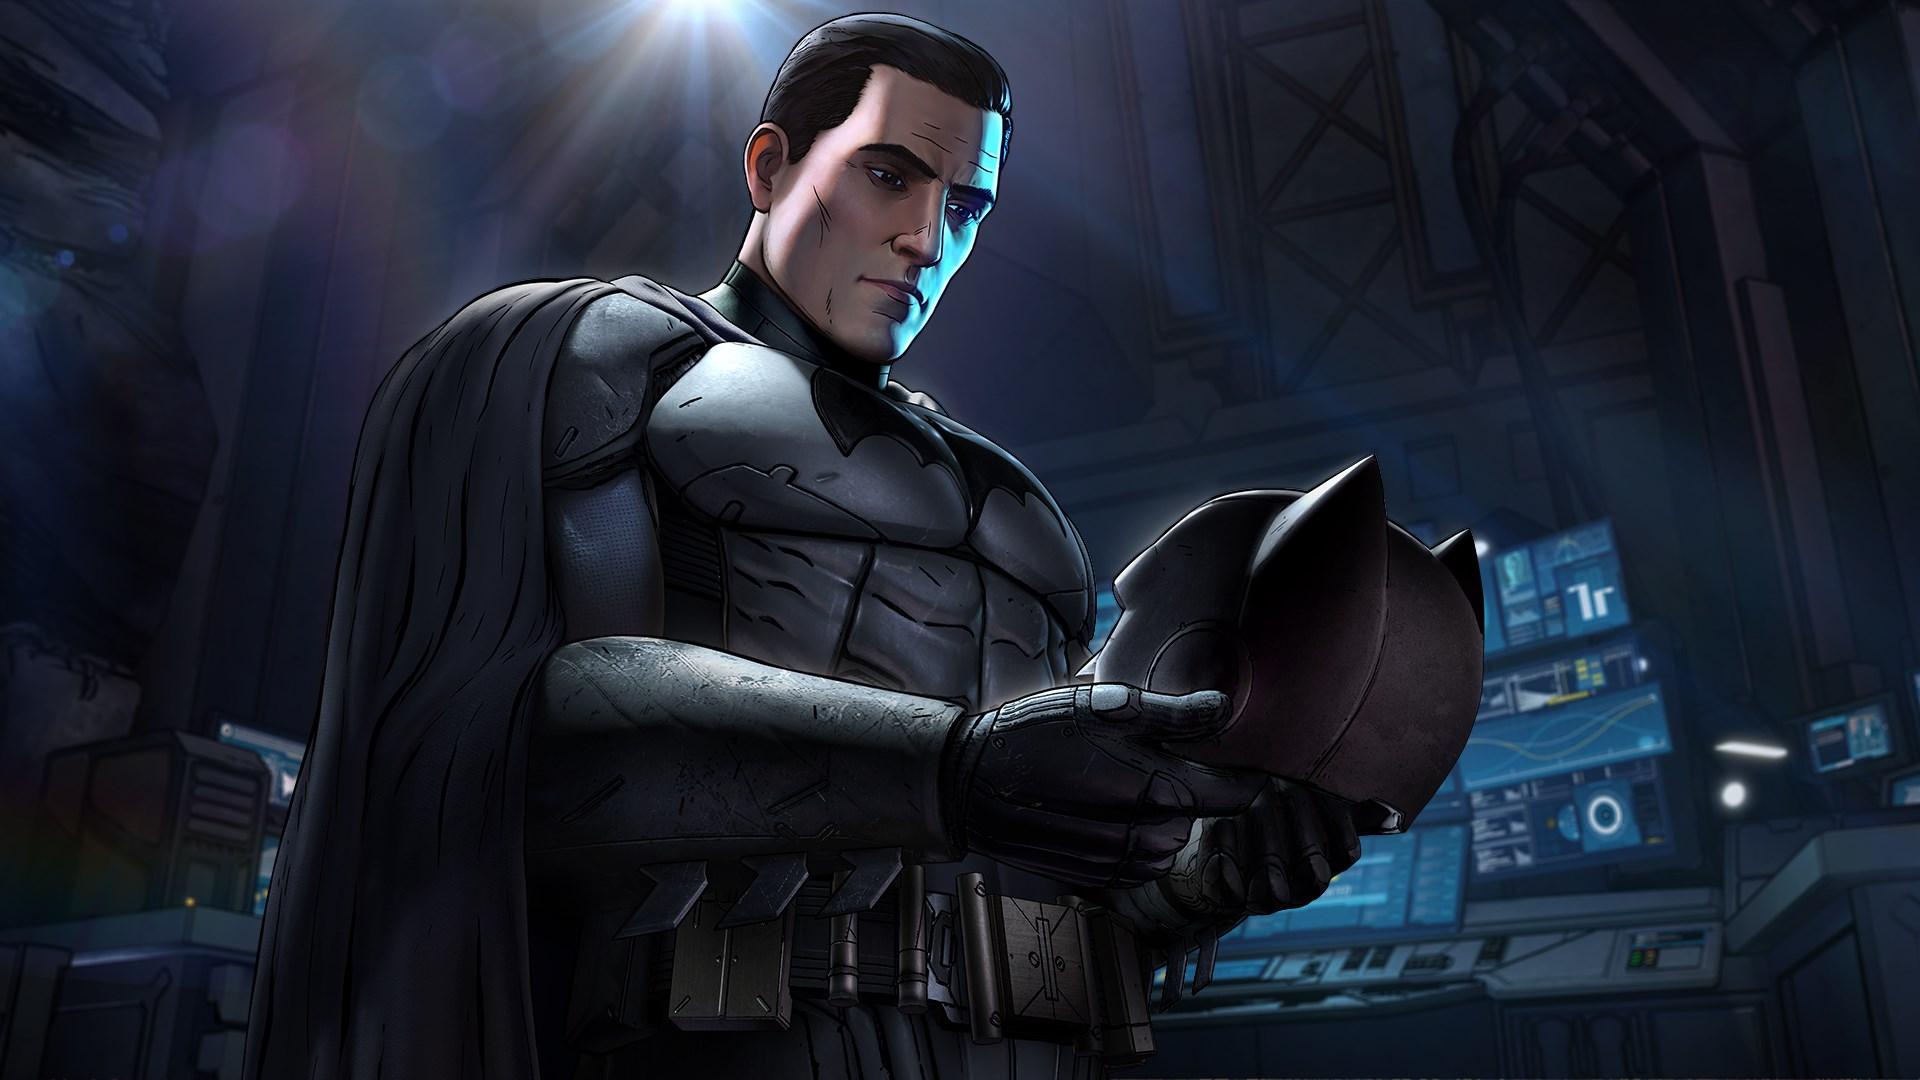 Batman - The Telltale Series - Episode 2: Children of Arkham - Disc